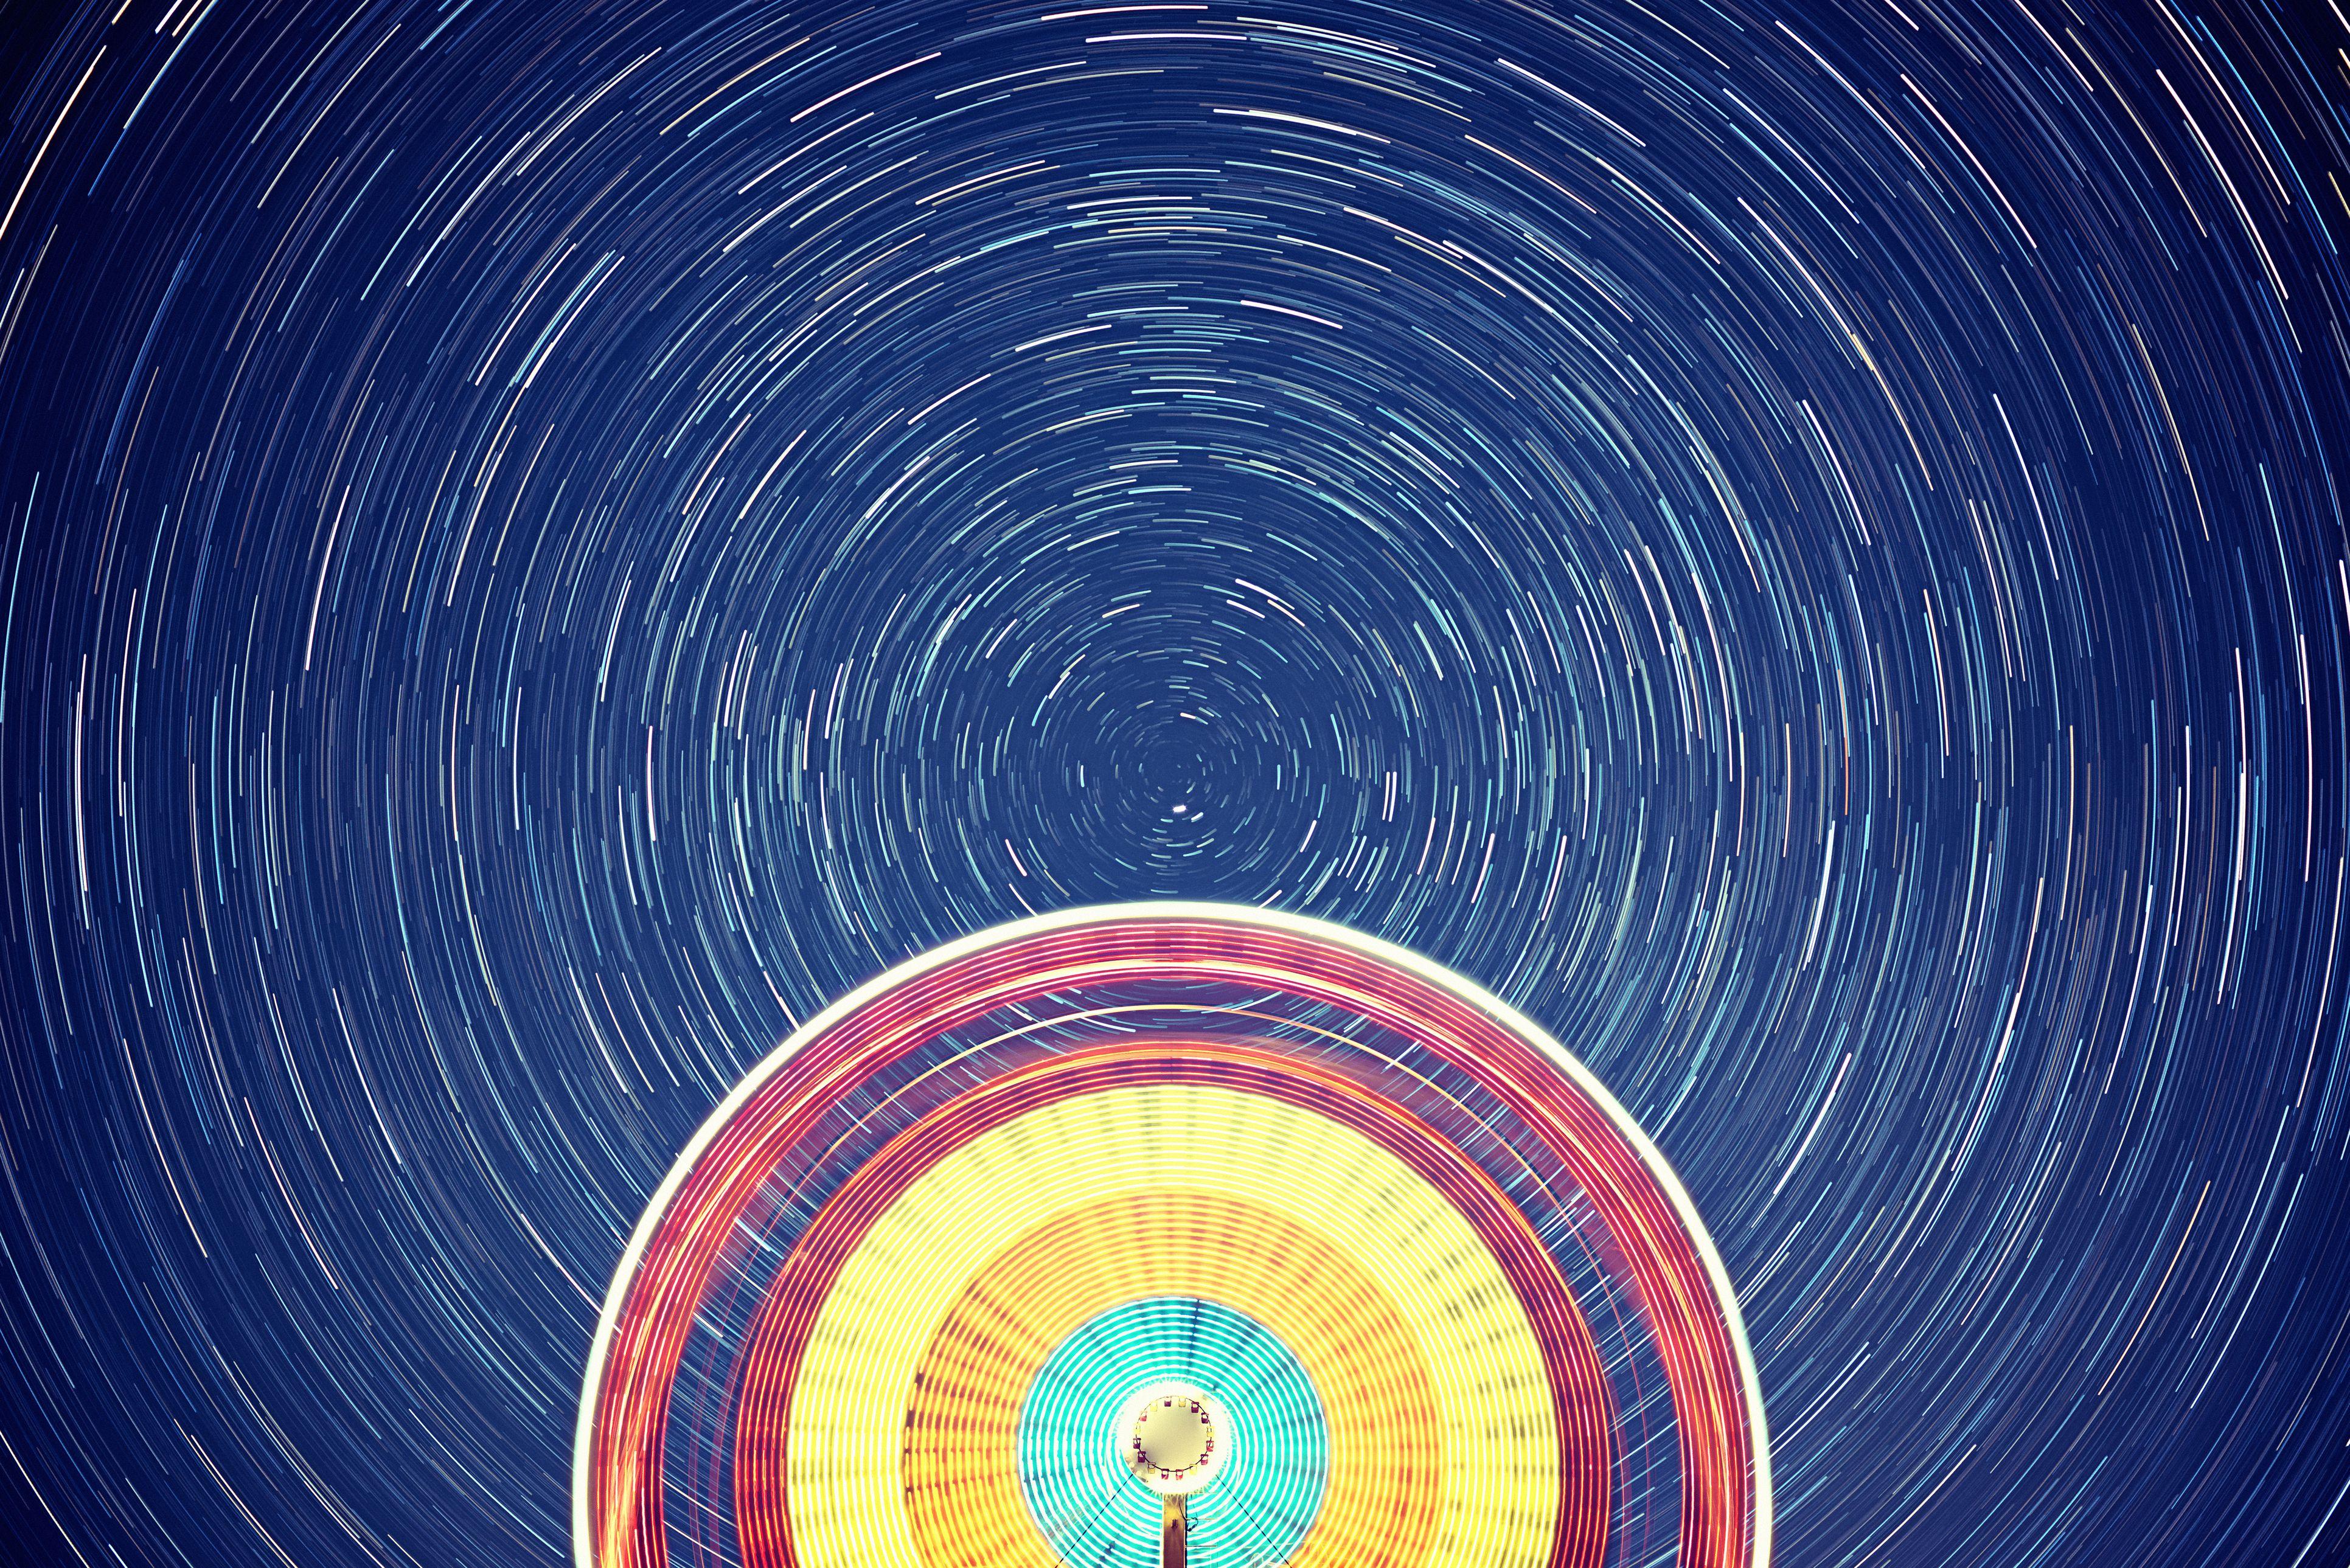 Texas Star Ferris Wheel Lights Up The Big Texas Sky